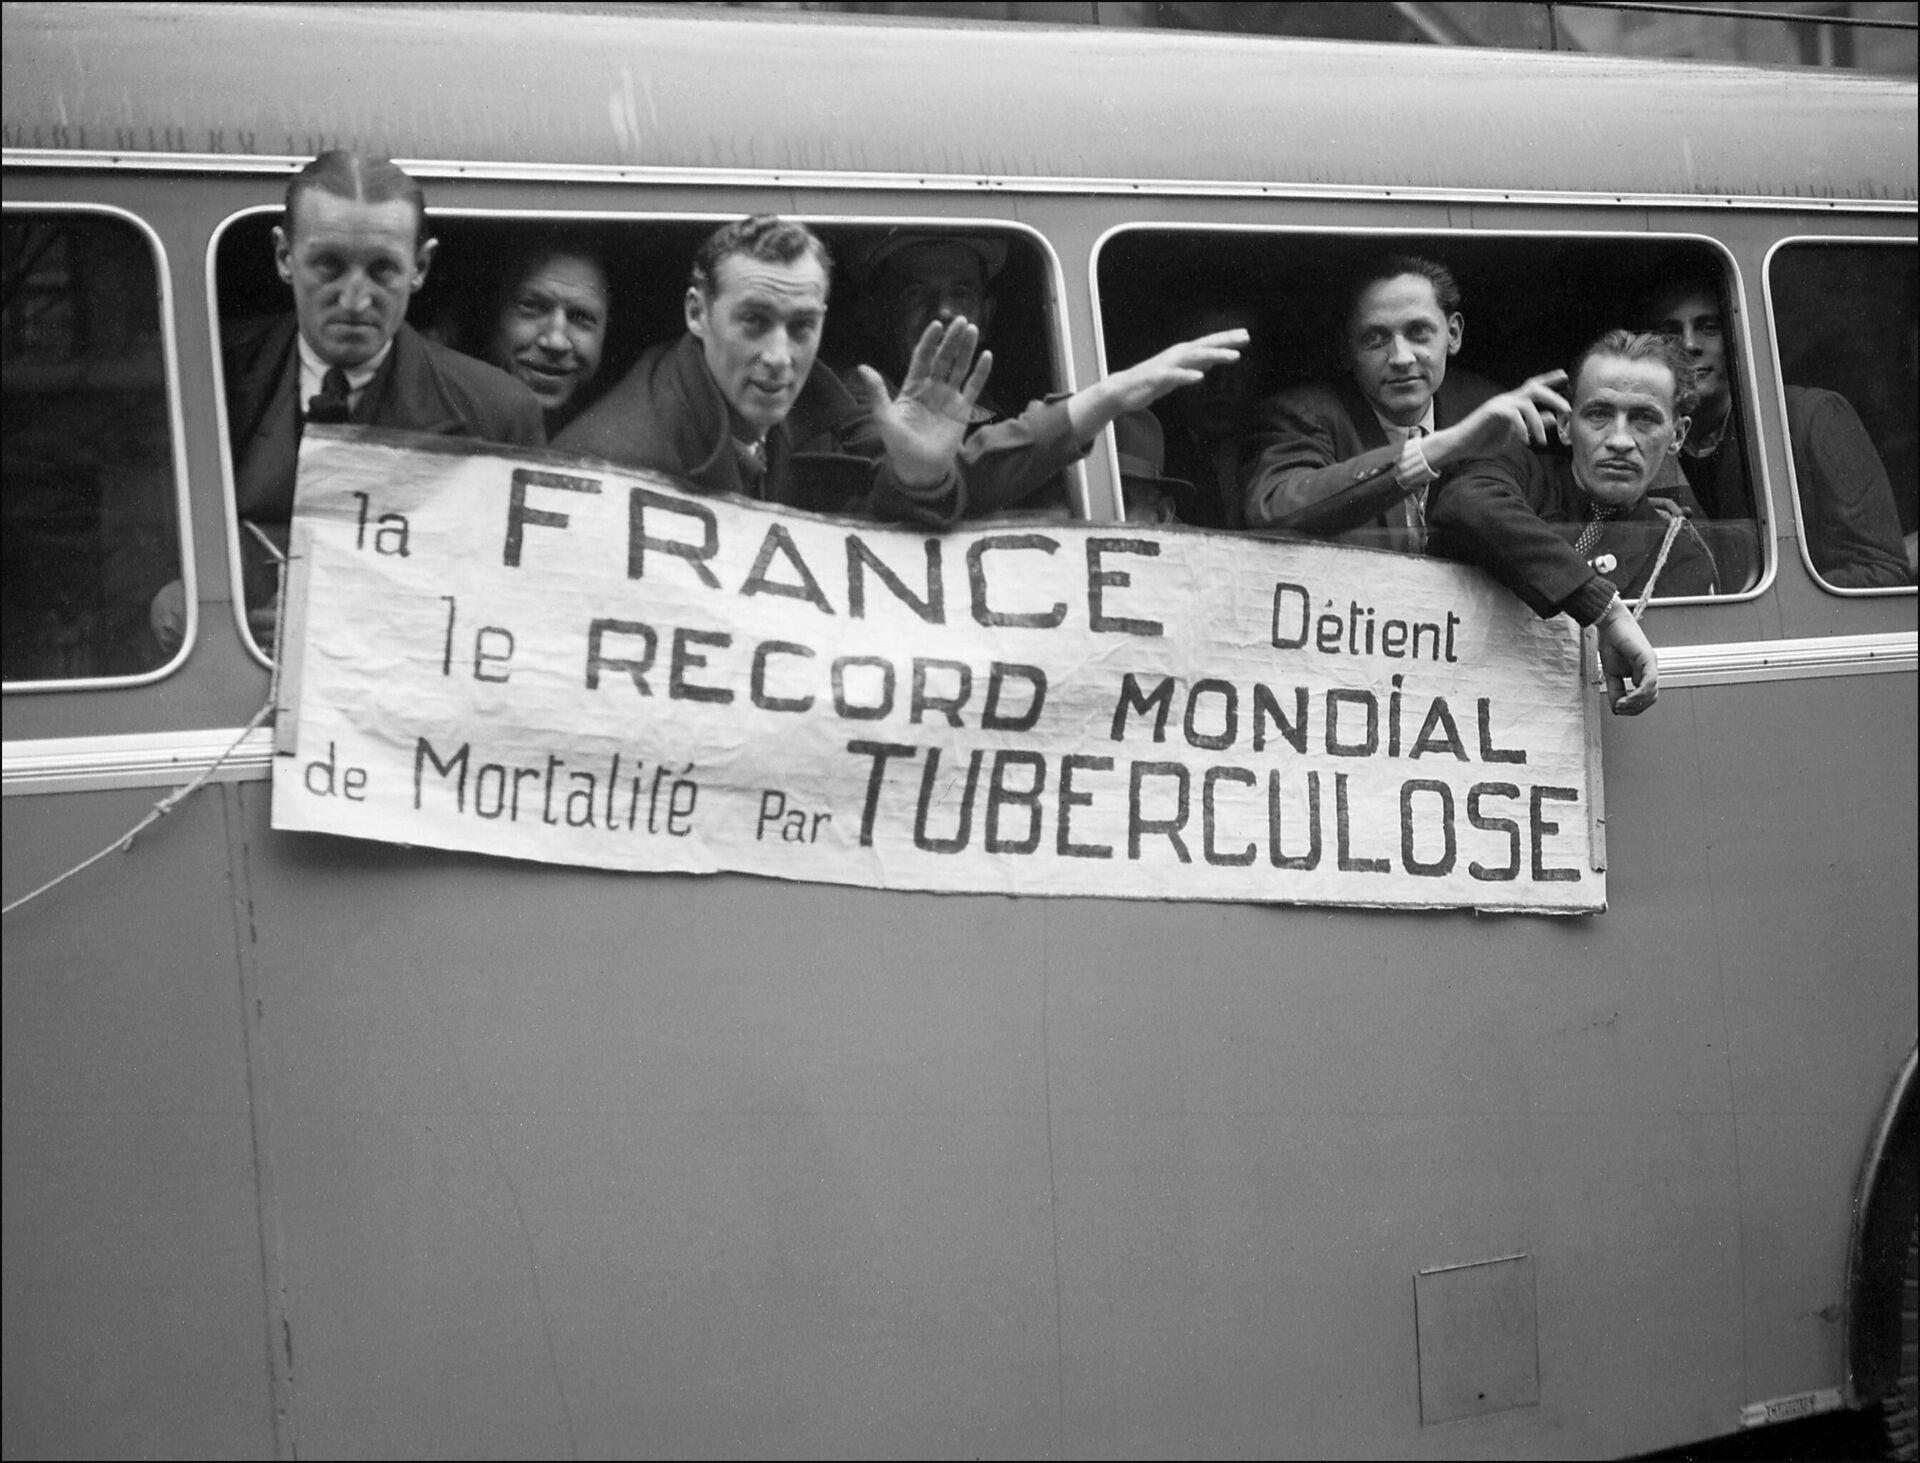 Infectados de tuberculosis en Francia  - Sputnik Mundo, 1920, 05.08.2021